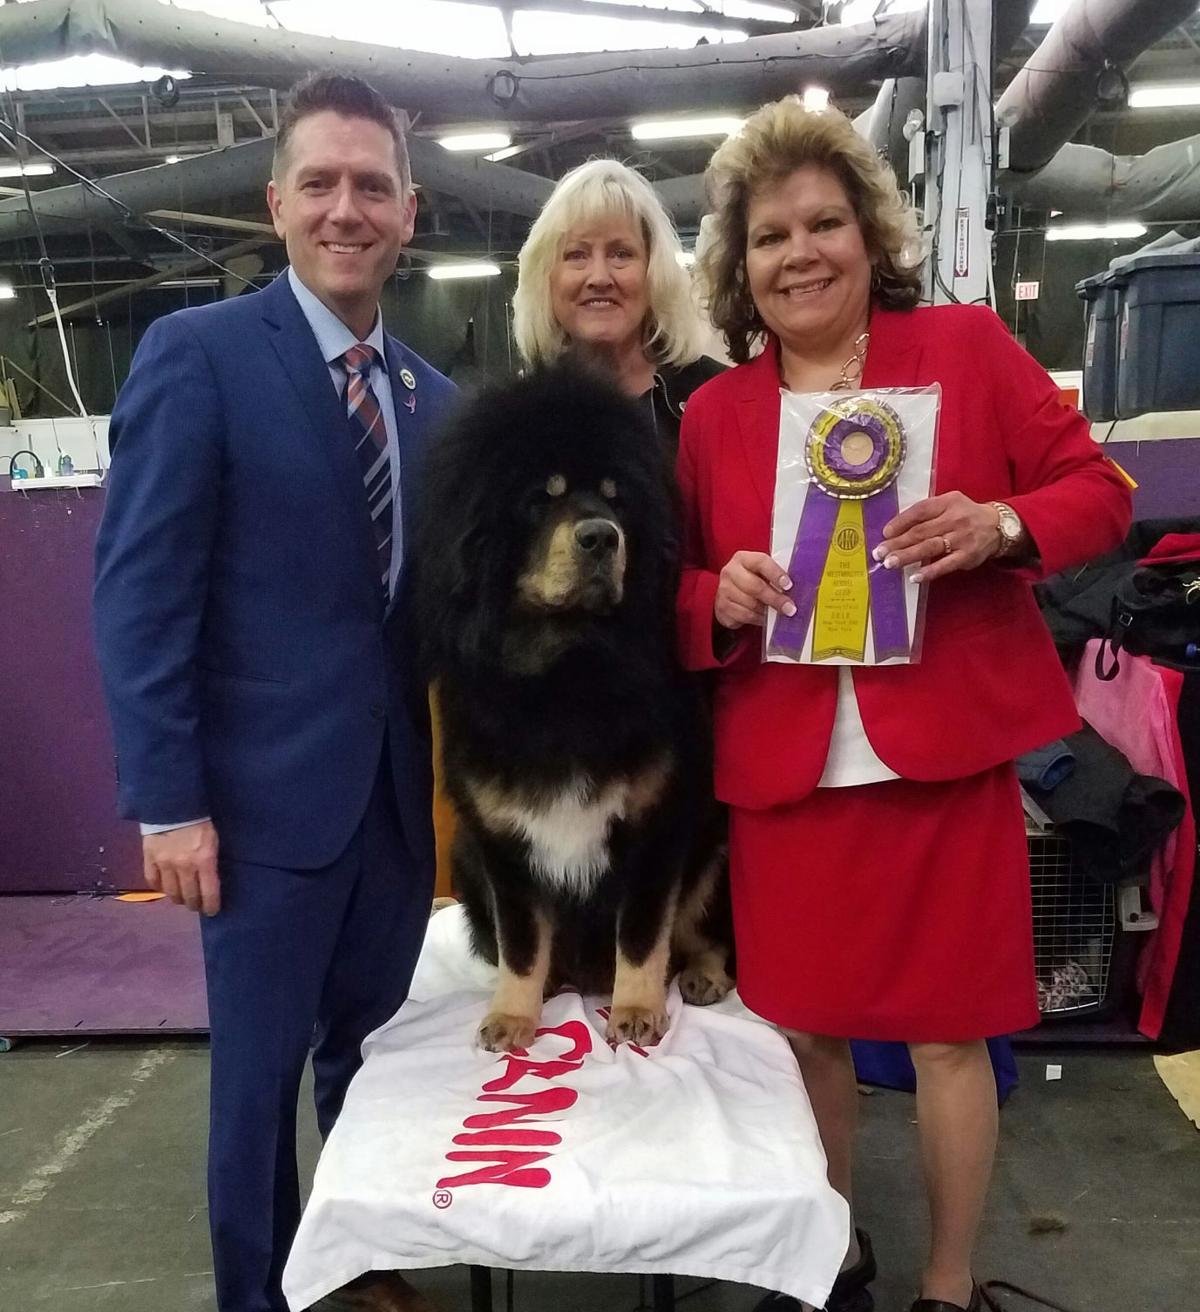 Audrey Lee, Evo win big at Westminster Dog Show